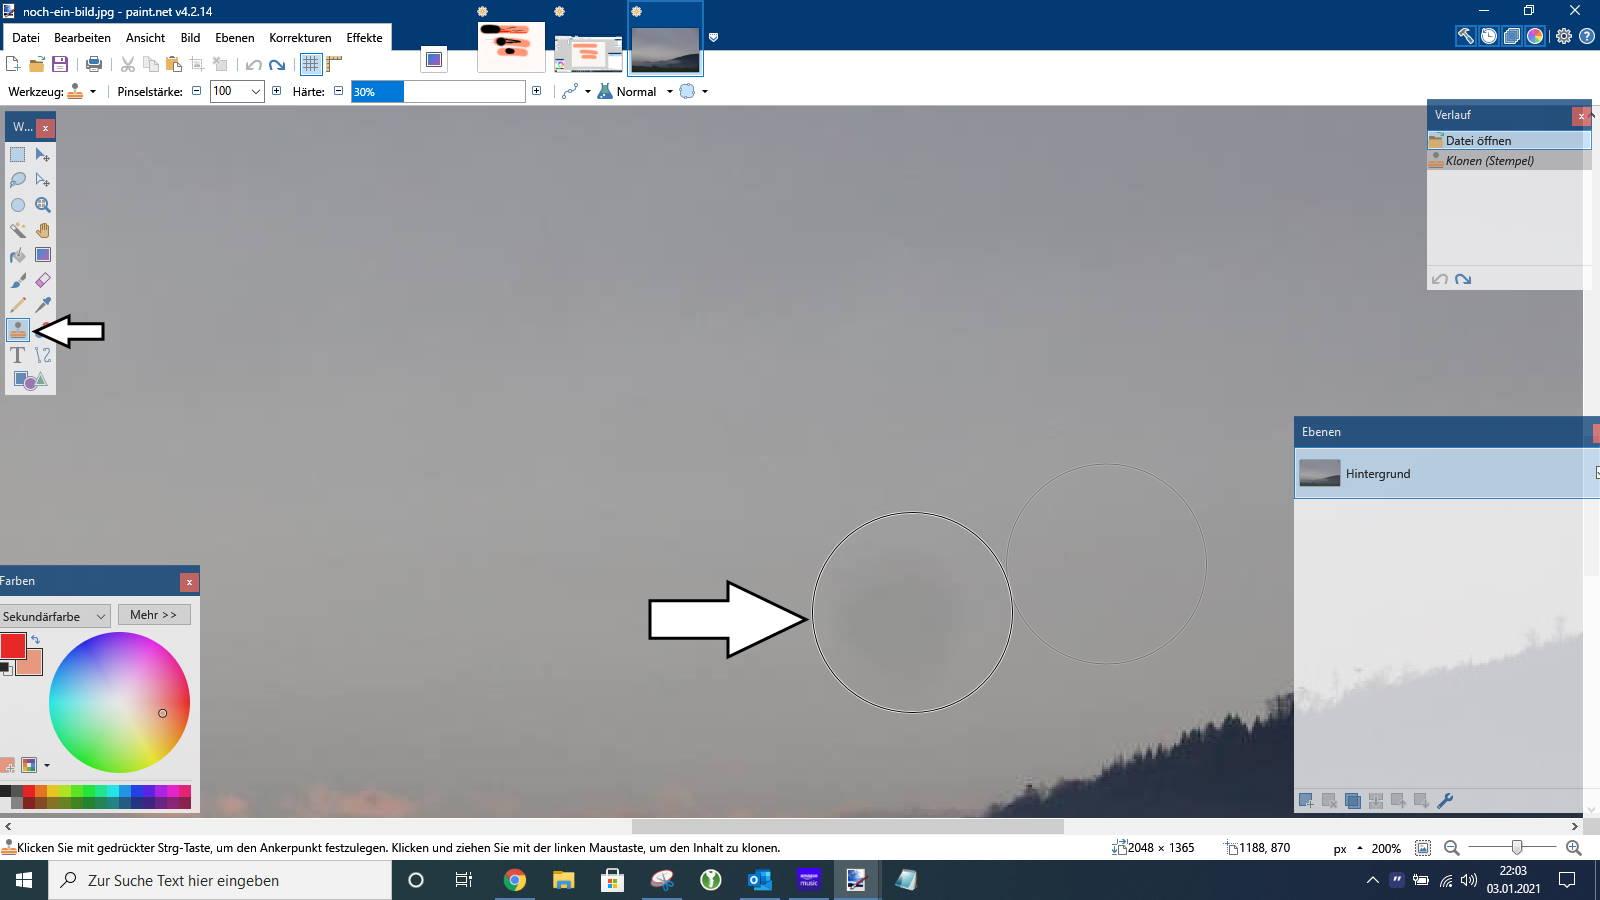 Paint.NET mit Klon-Werkzeug Fleck entfernen